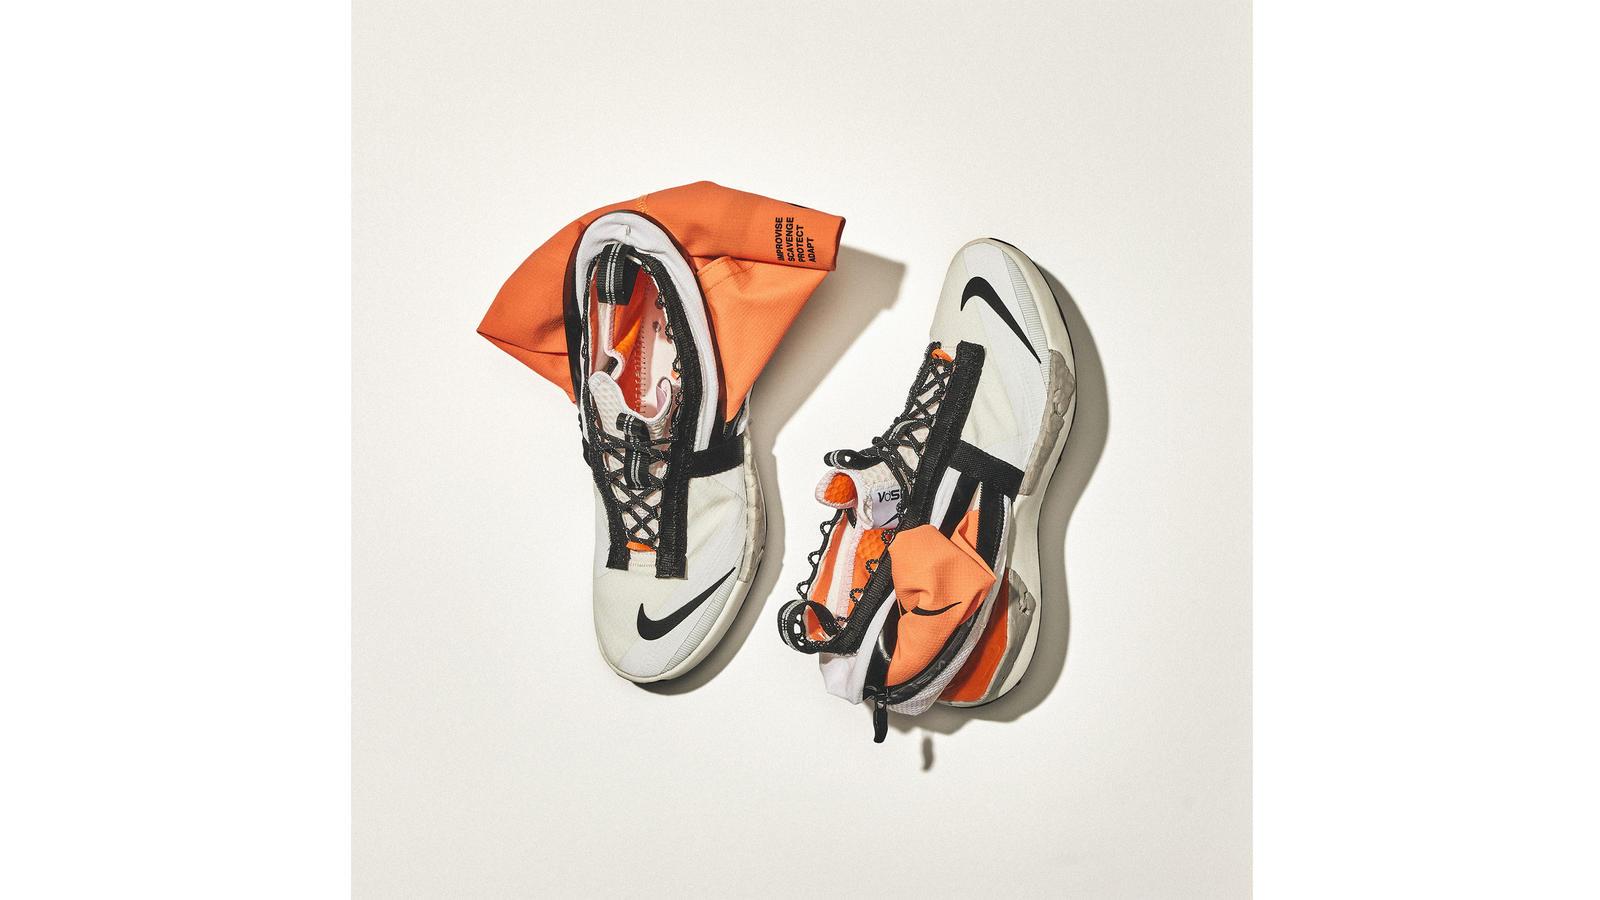 Nike ISPA Drifter Gator 7